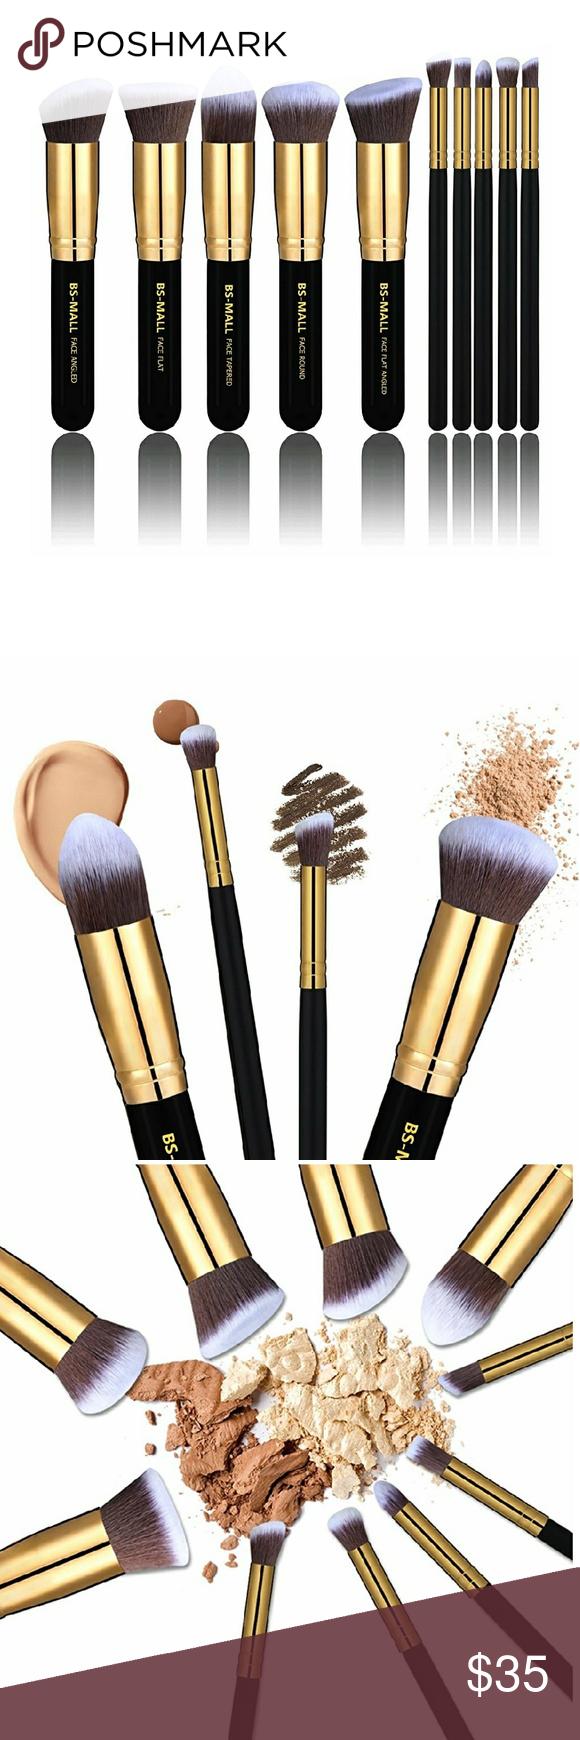 10 pcs. Black & Gold Synthetic Kabuki Brushes Makeup